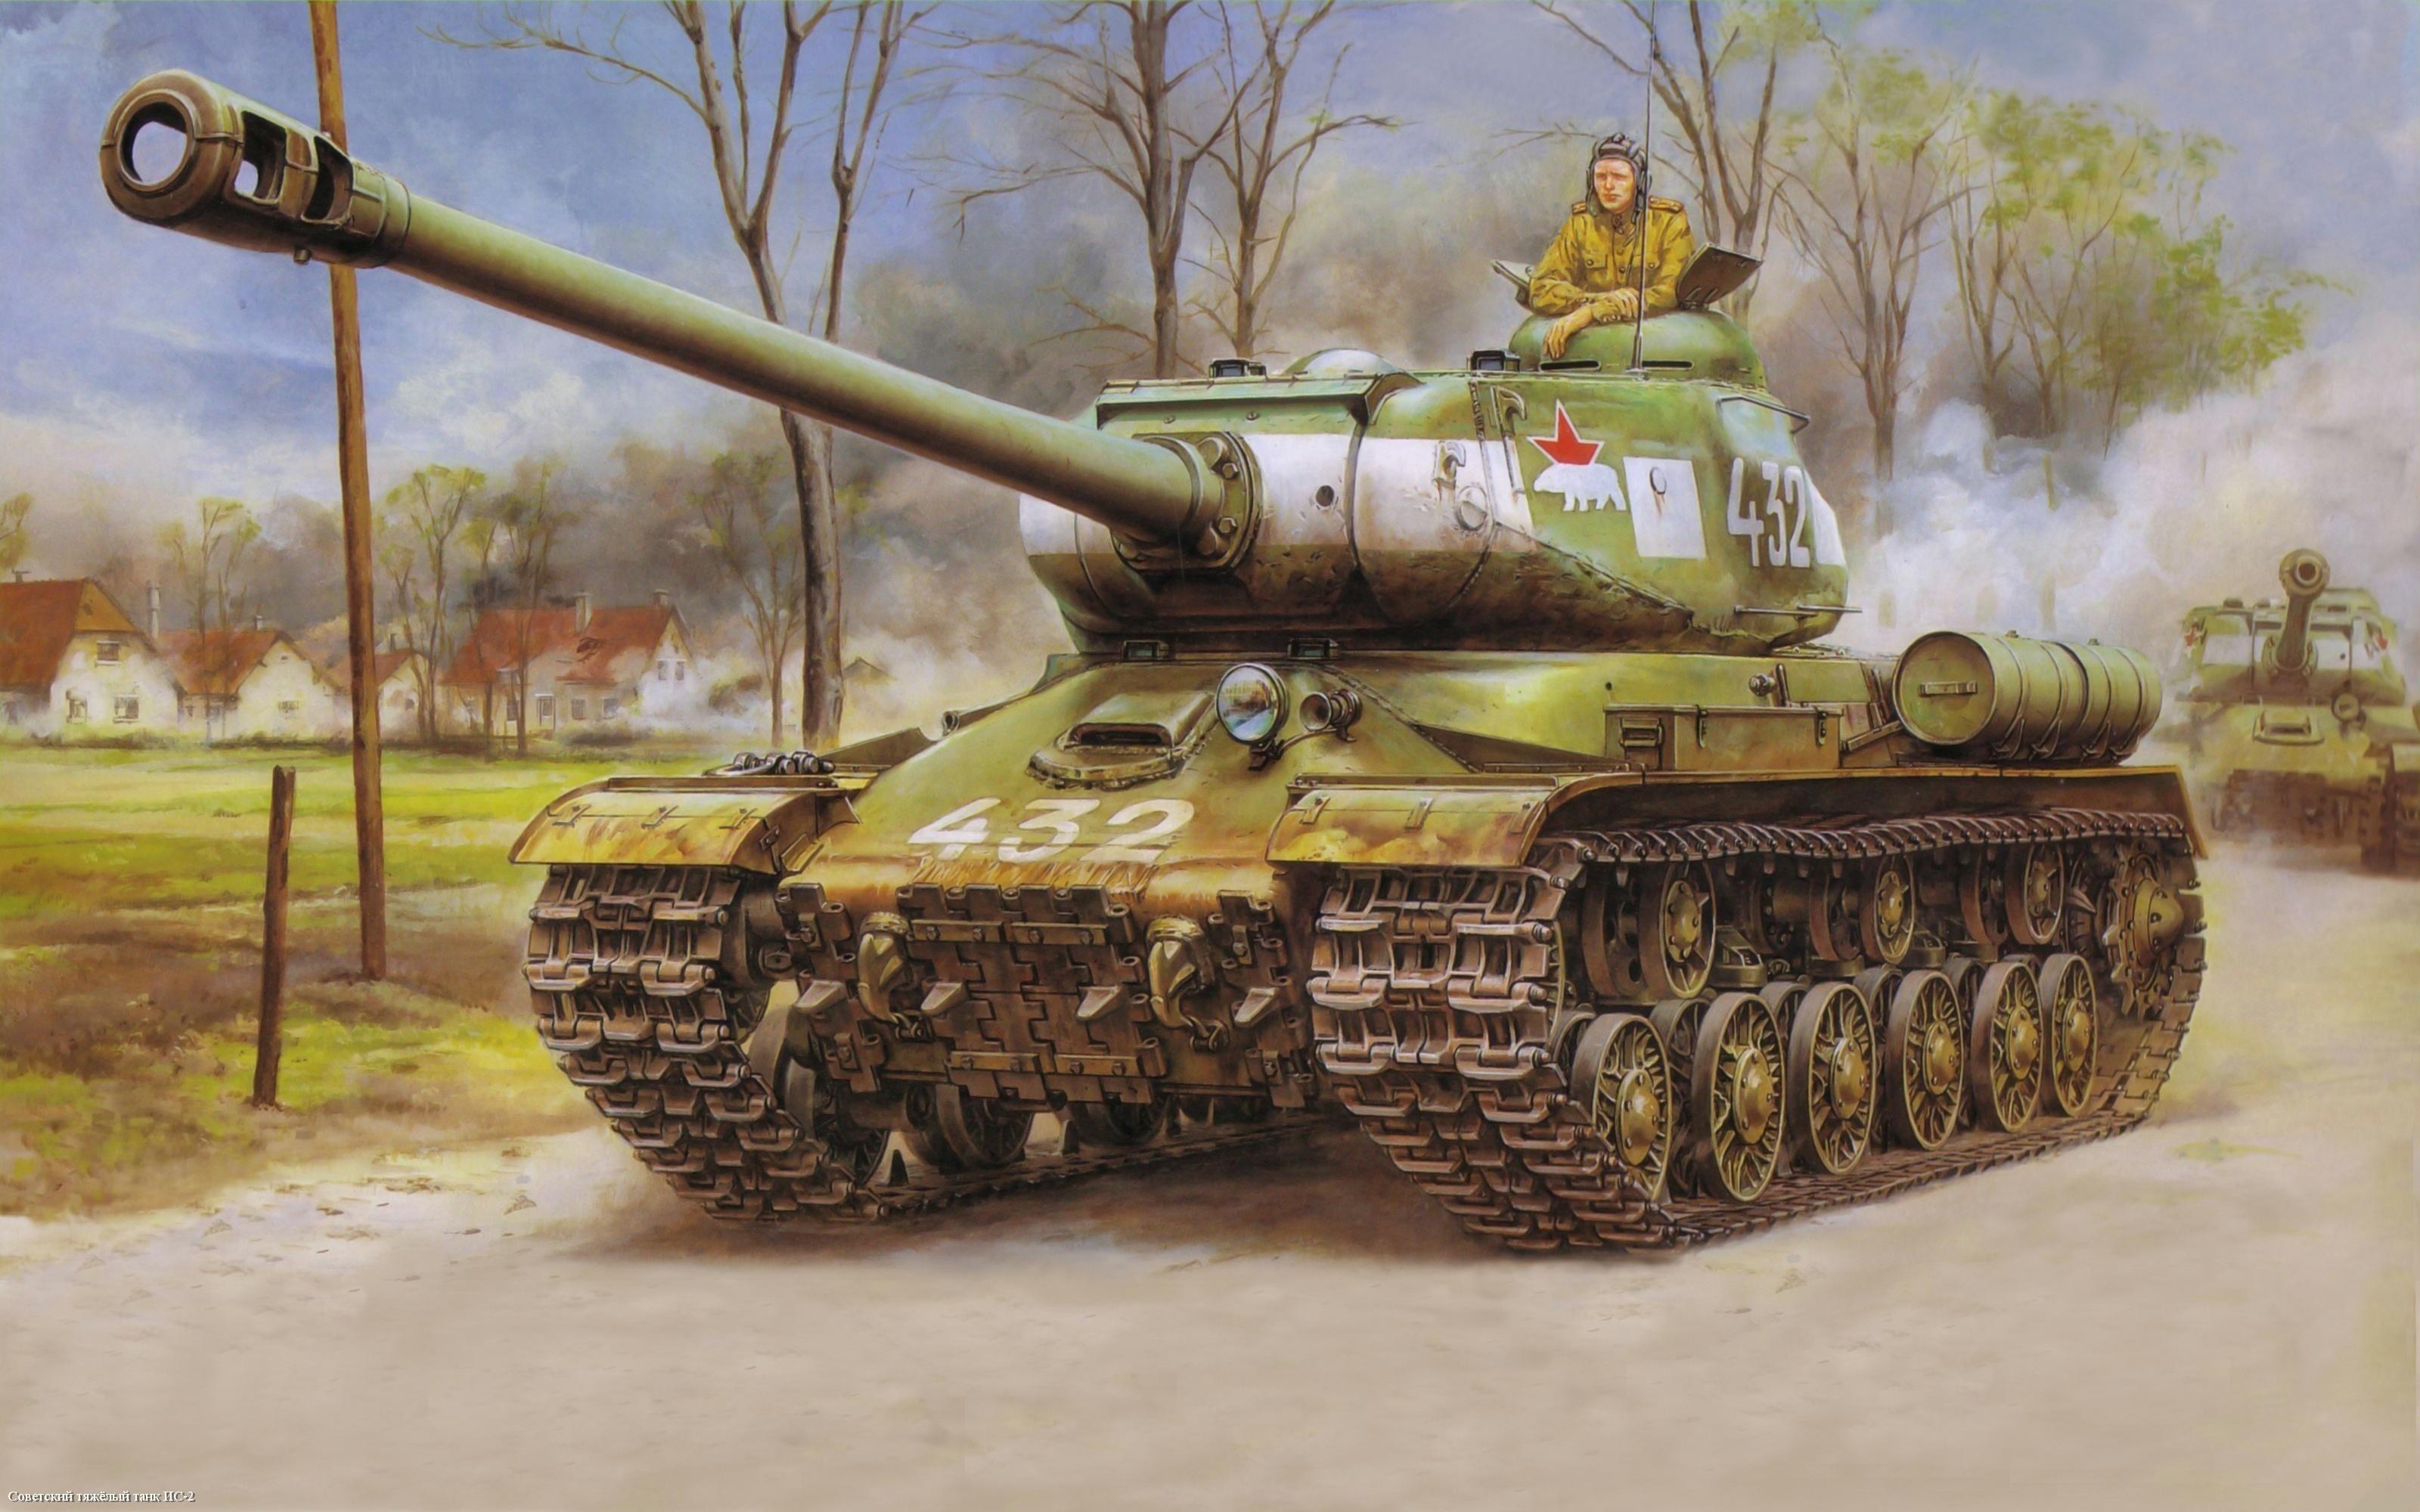 Custom Silk Photo Wallpaper Hd Military Tank Wall: IS Tank Family HD Wallpaper